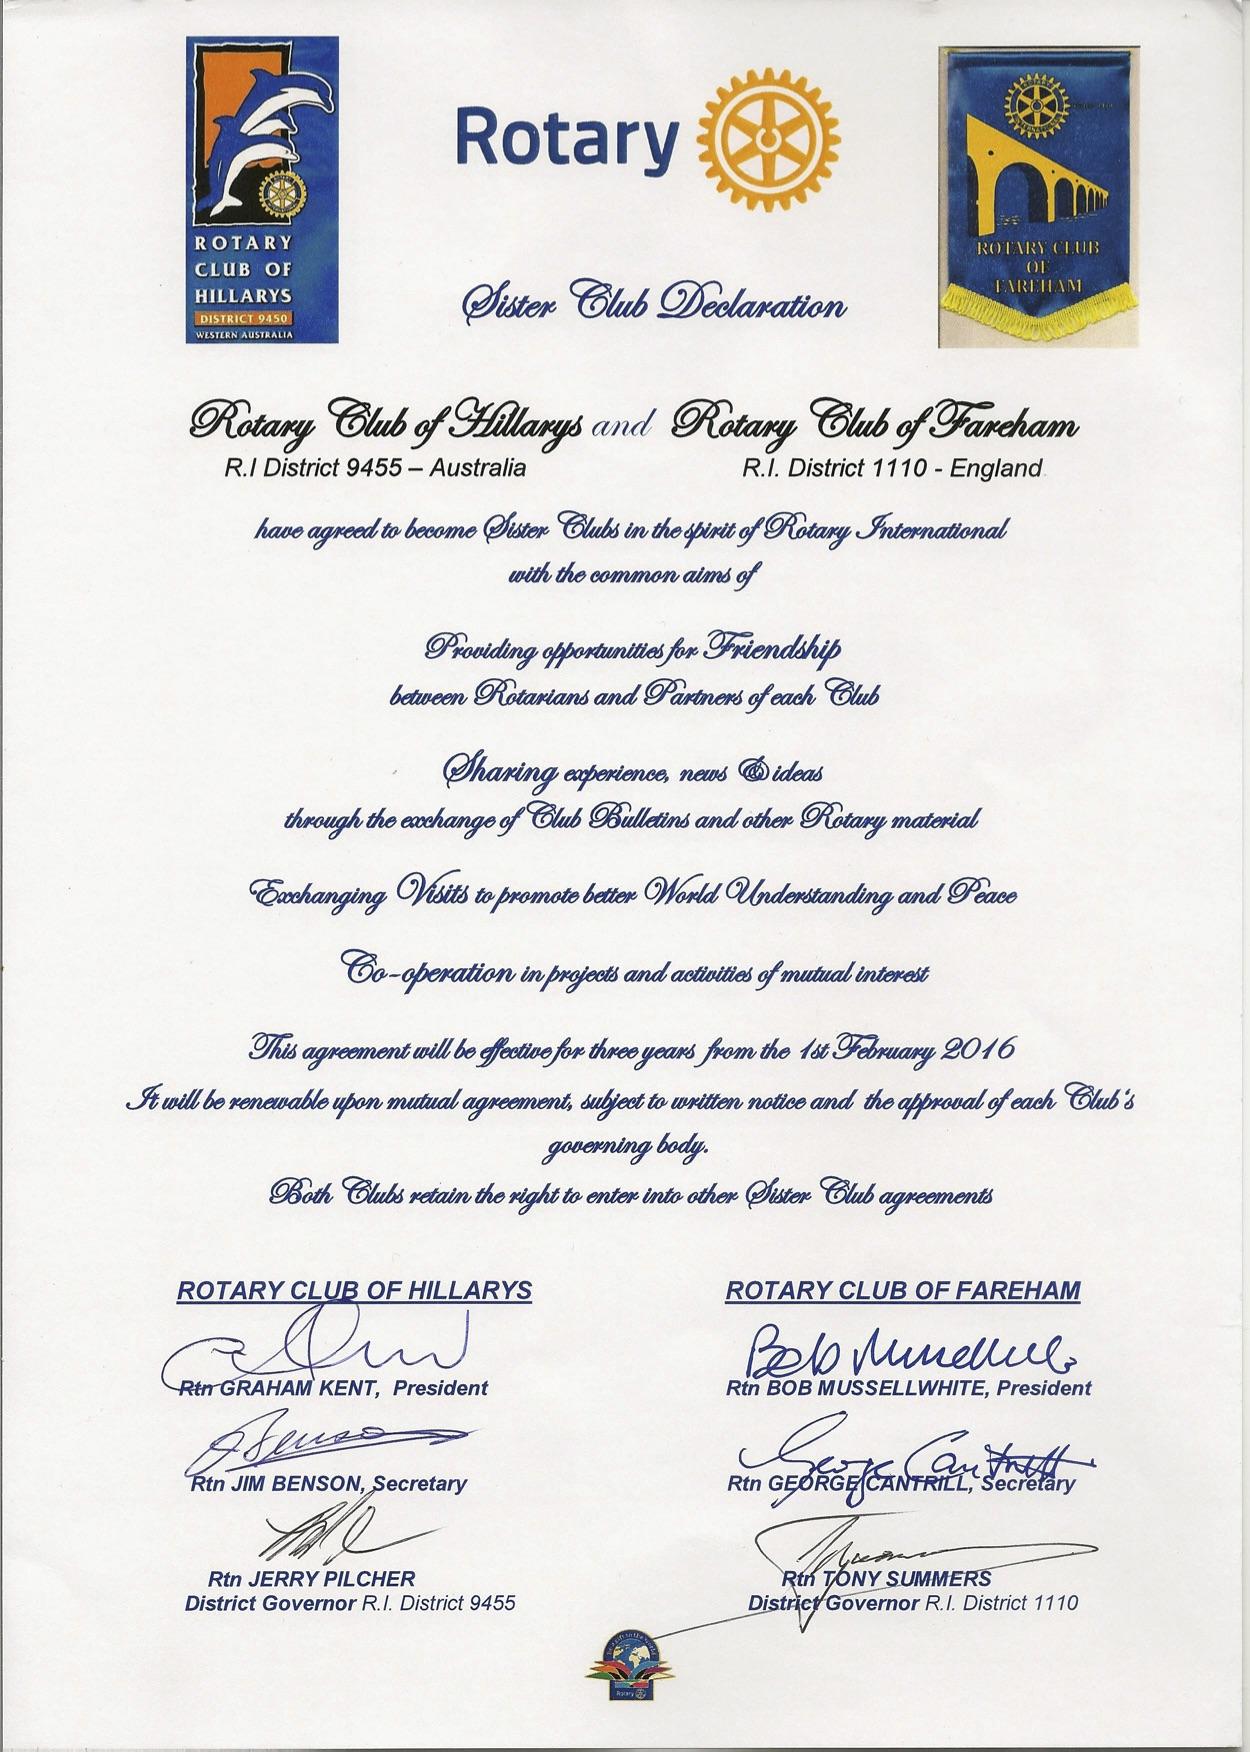 Rotary Club of Fareham